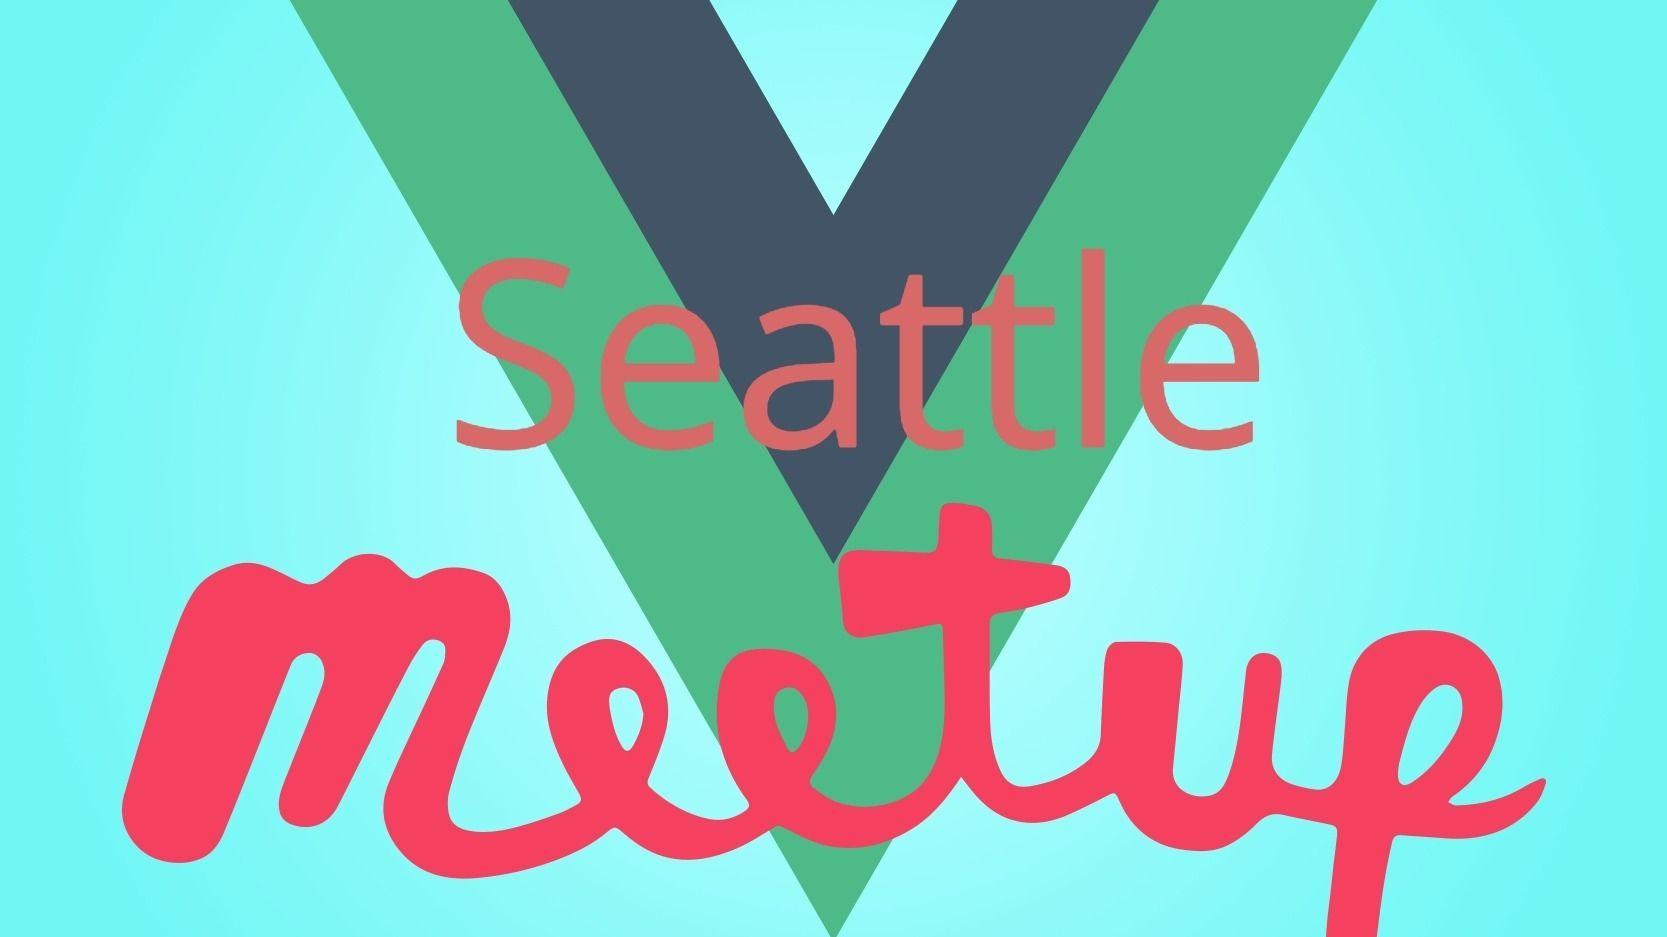 Seattle Vue.js